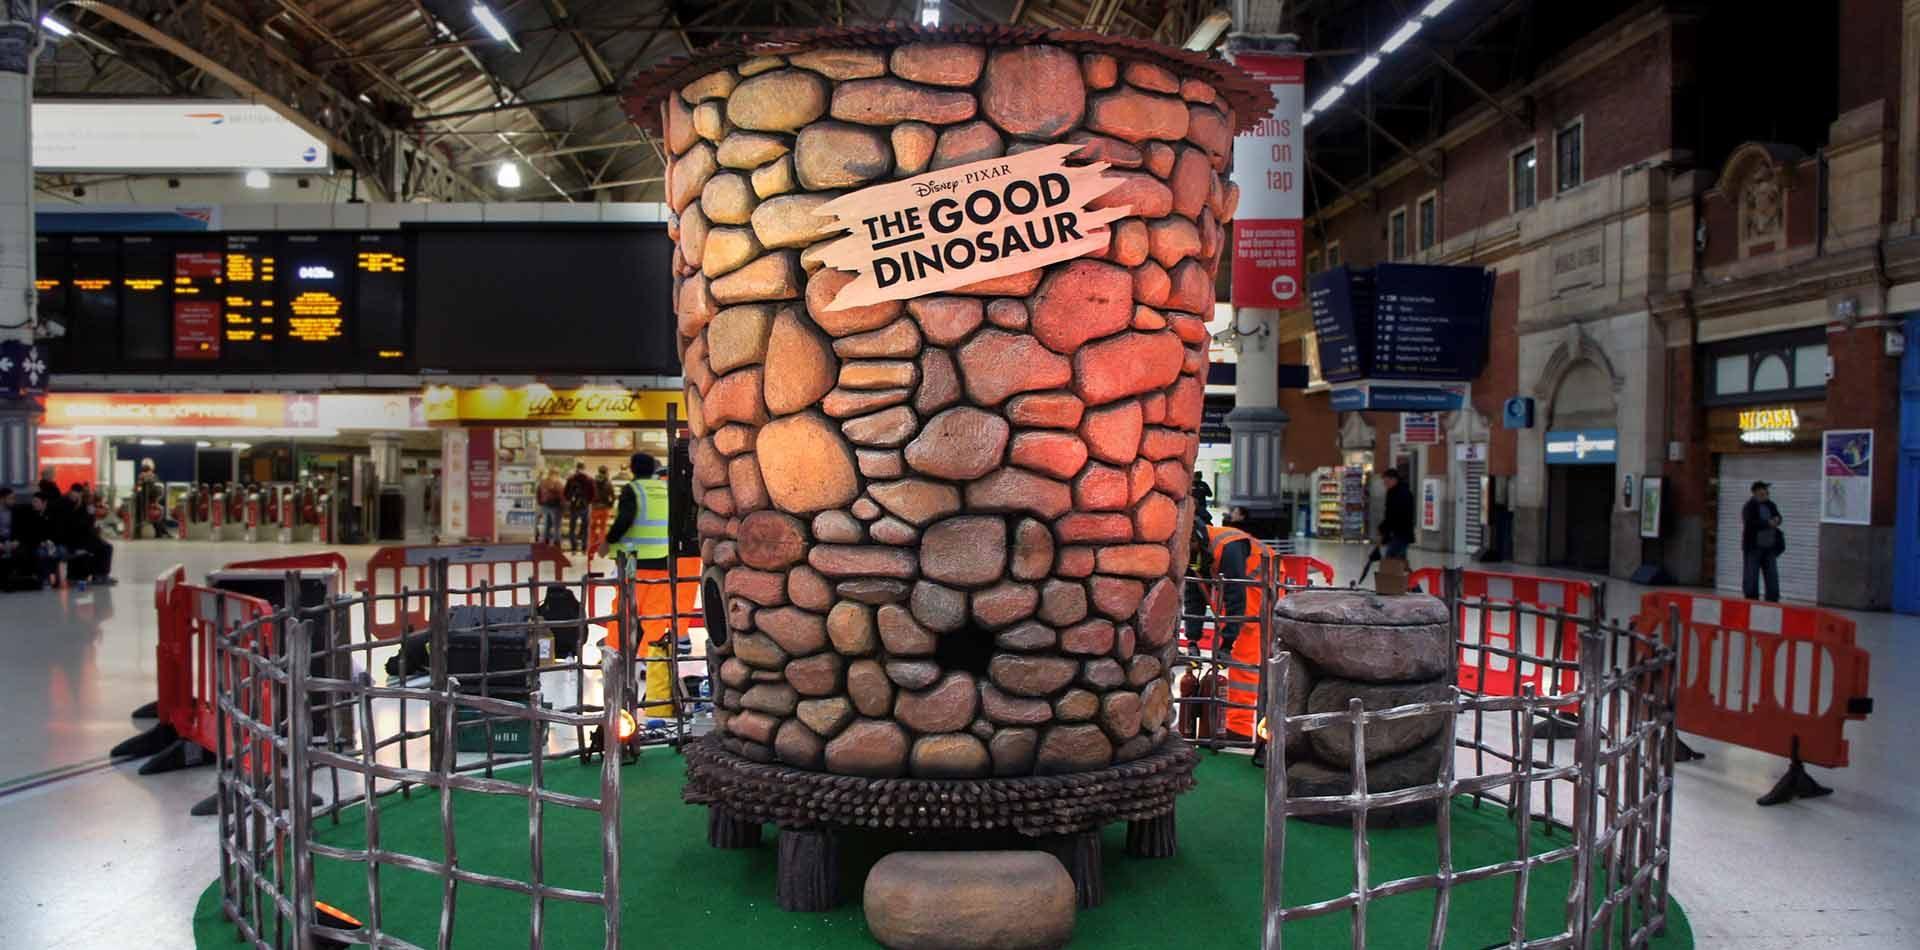 Film prop grain silo